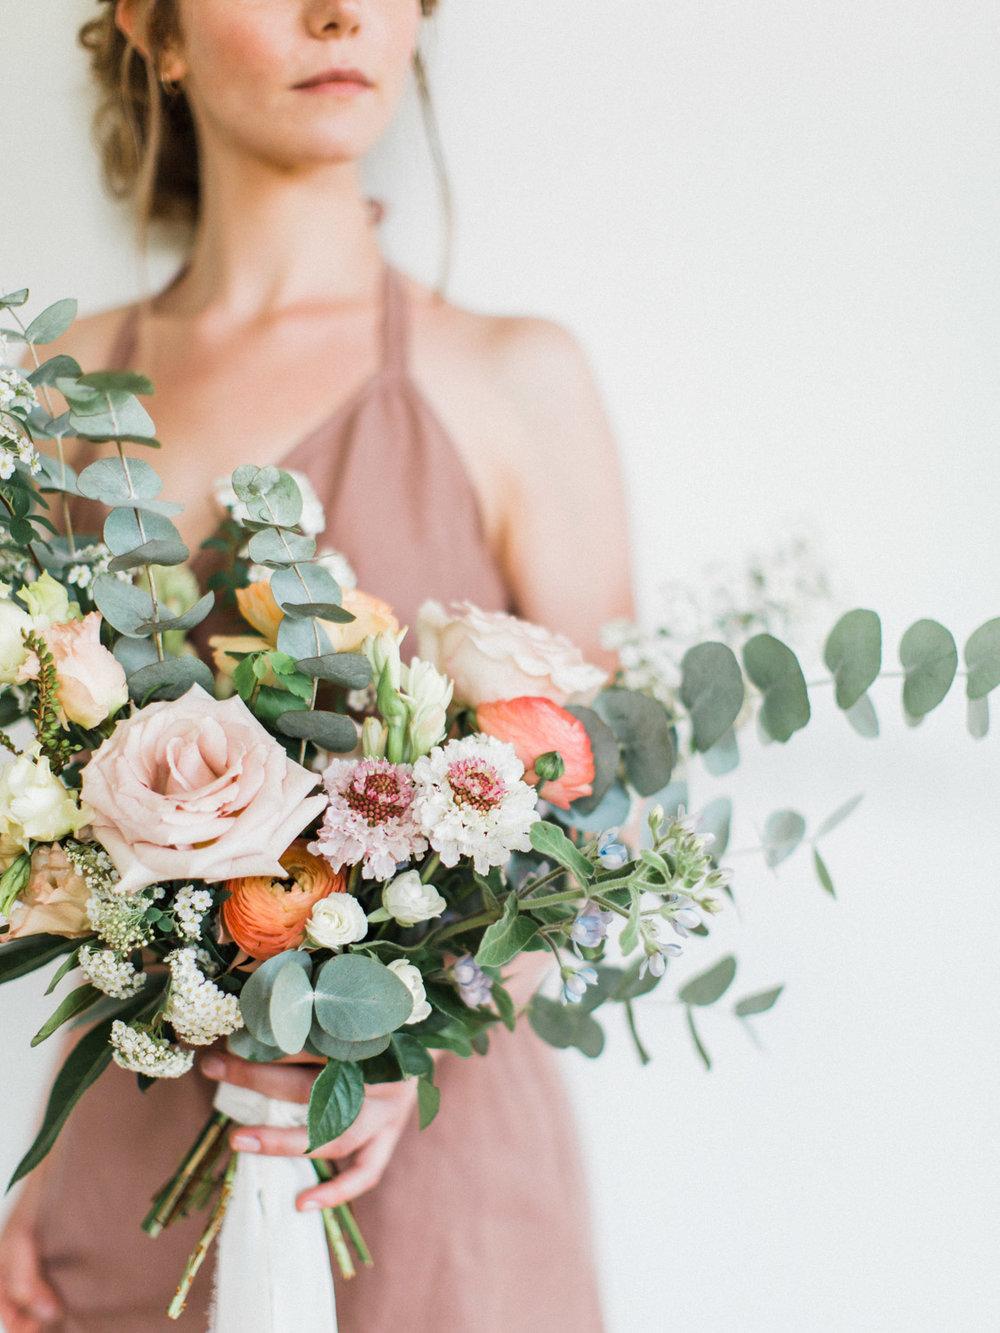 toronto-collingwood-wedding-photographer-at-home-engagement-inspiration 2018-374.jpg